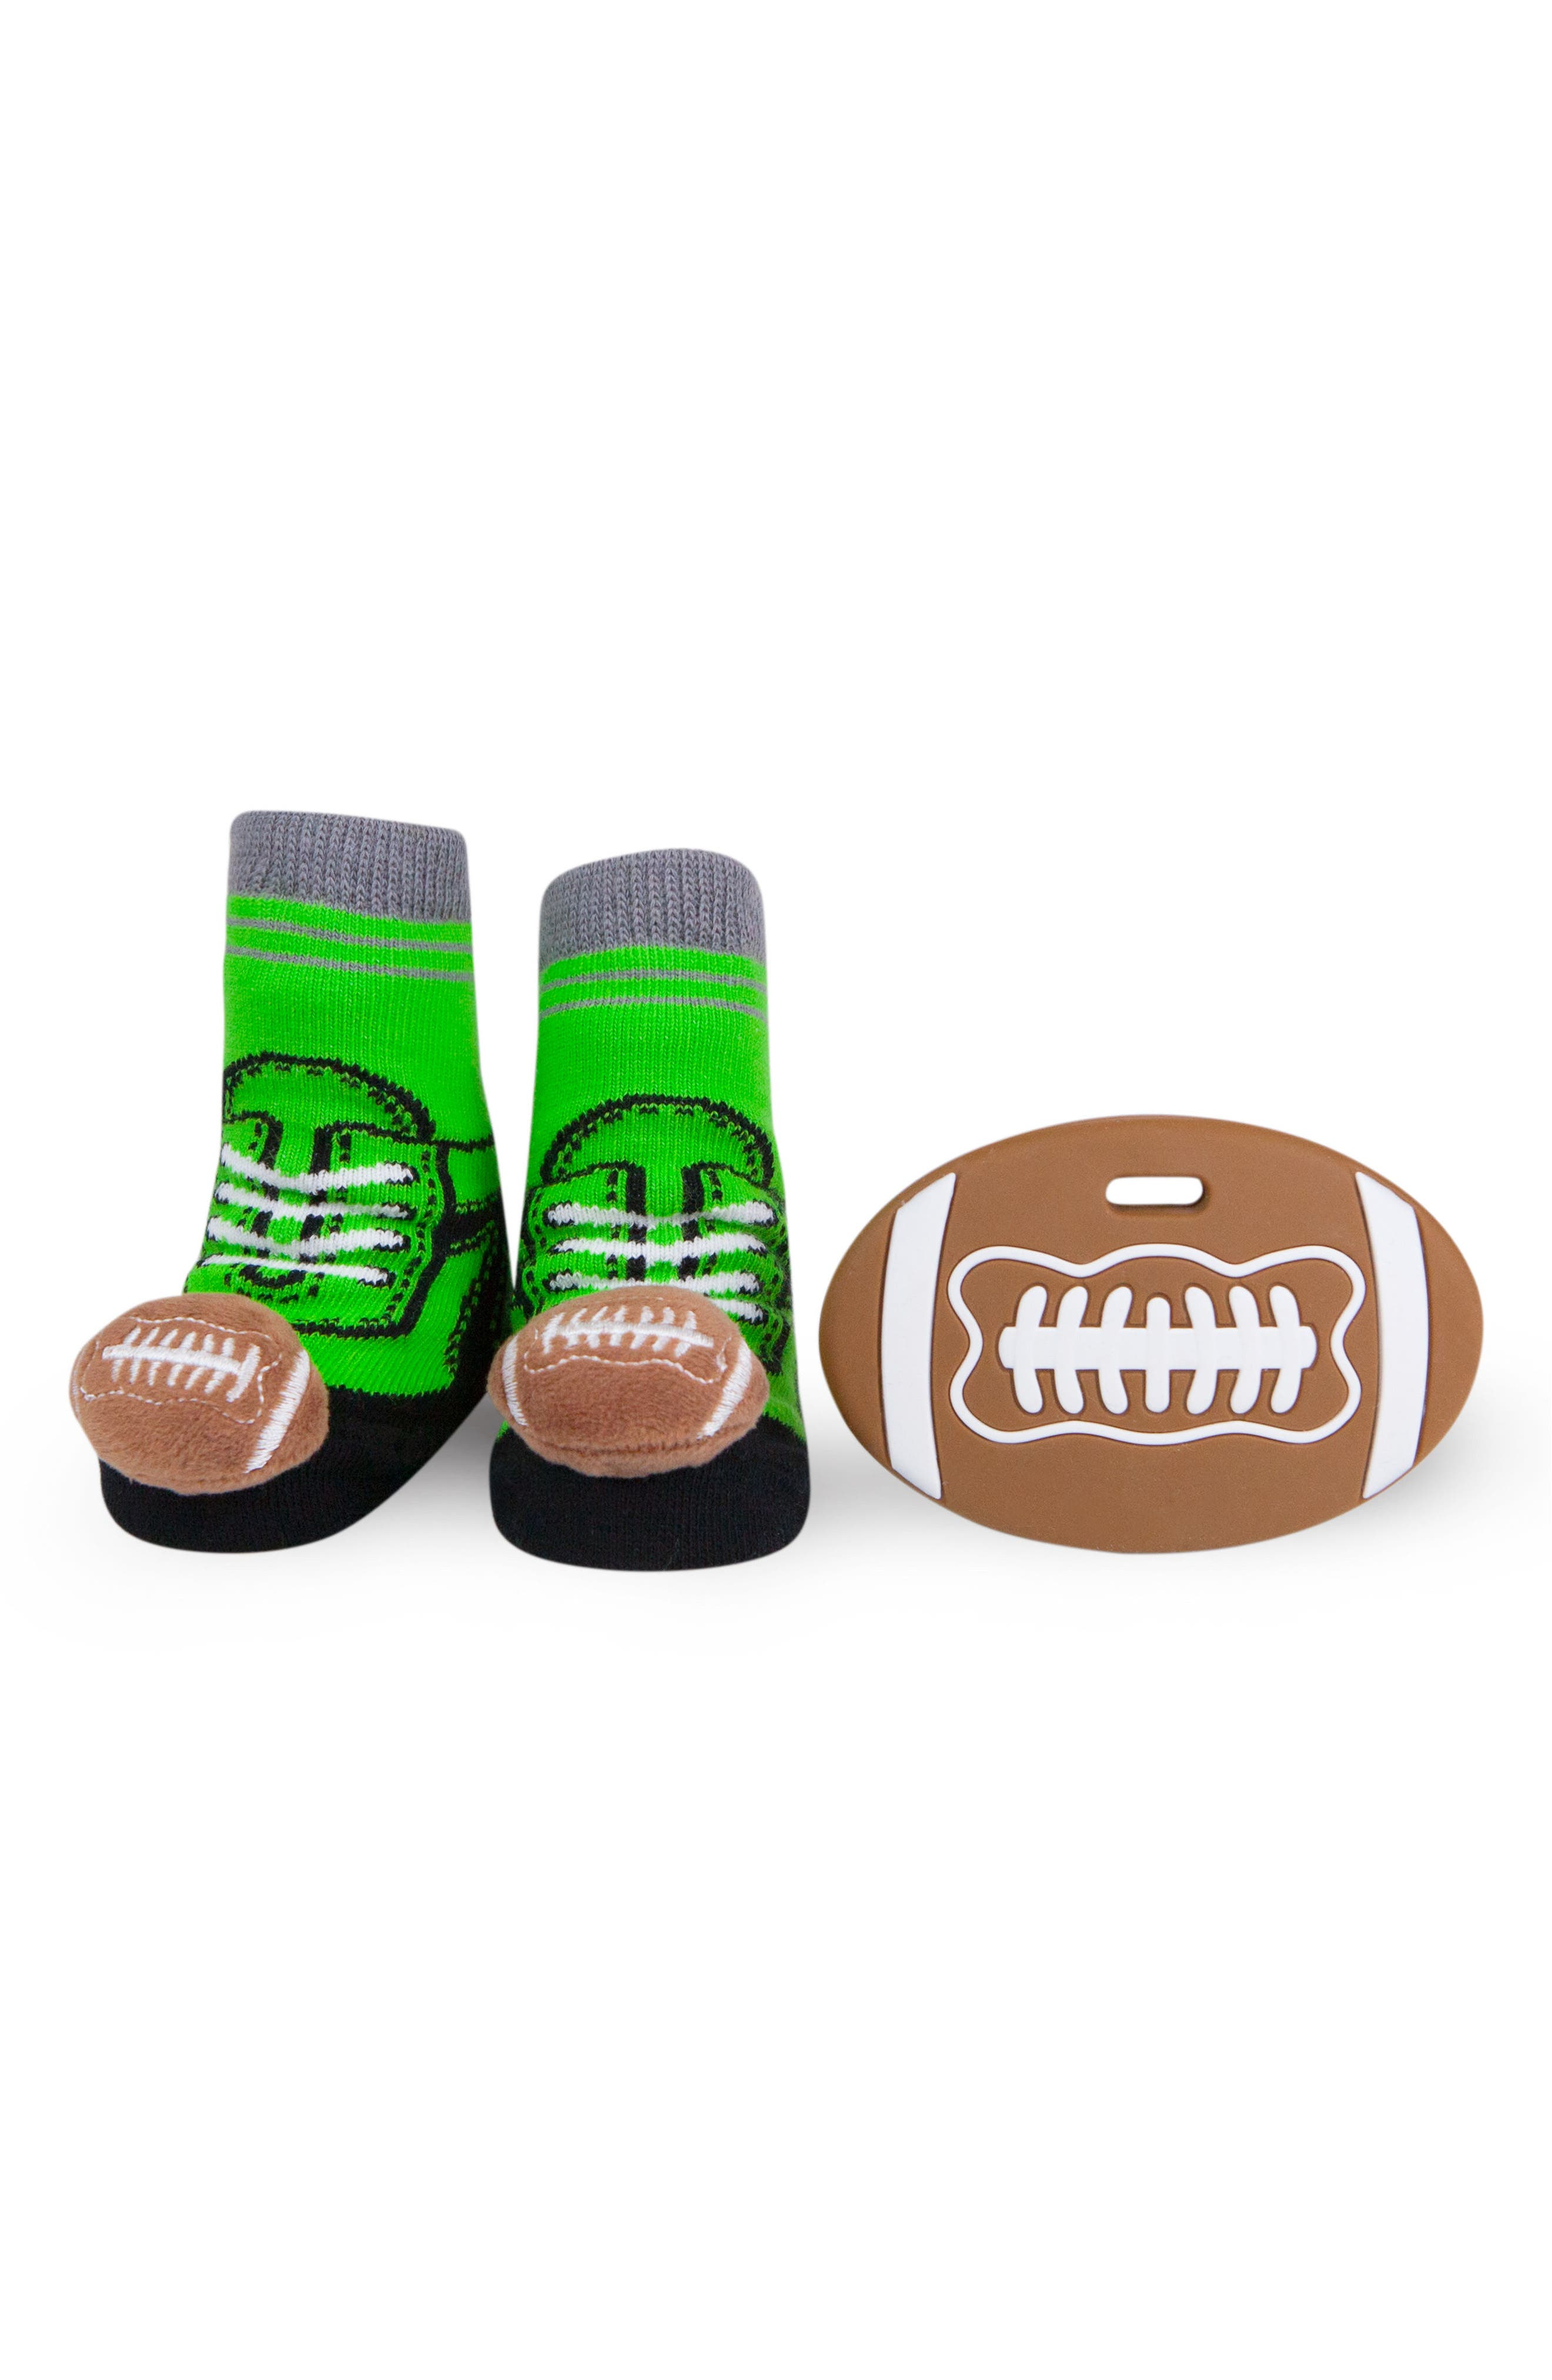 Football Rattle Socks & Teether Gift Set,                             Main thumbnail 1, color,                             Brown